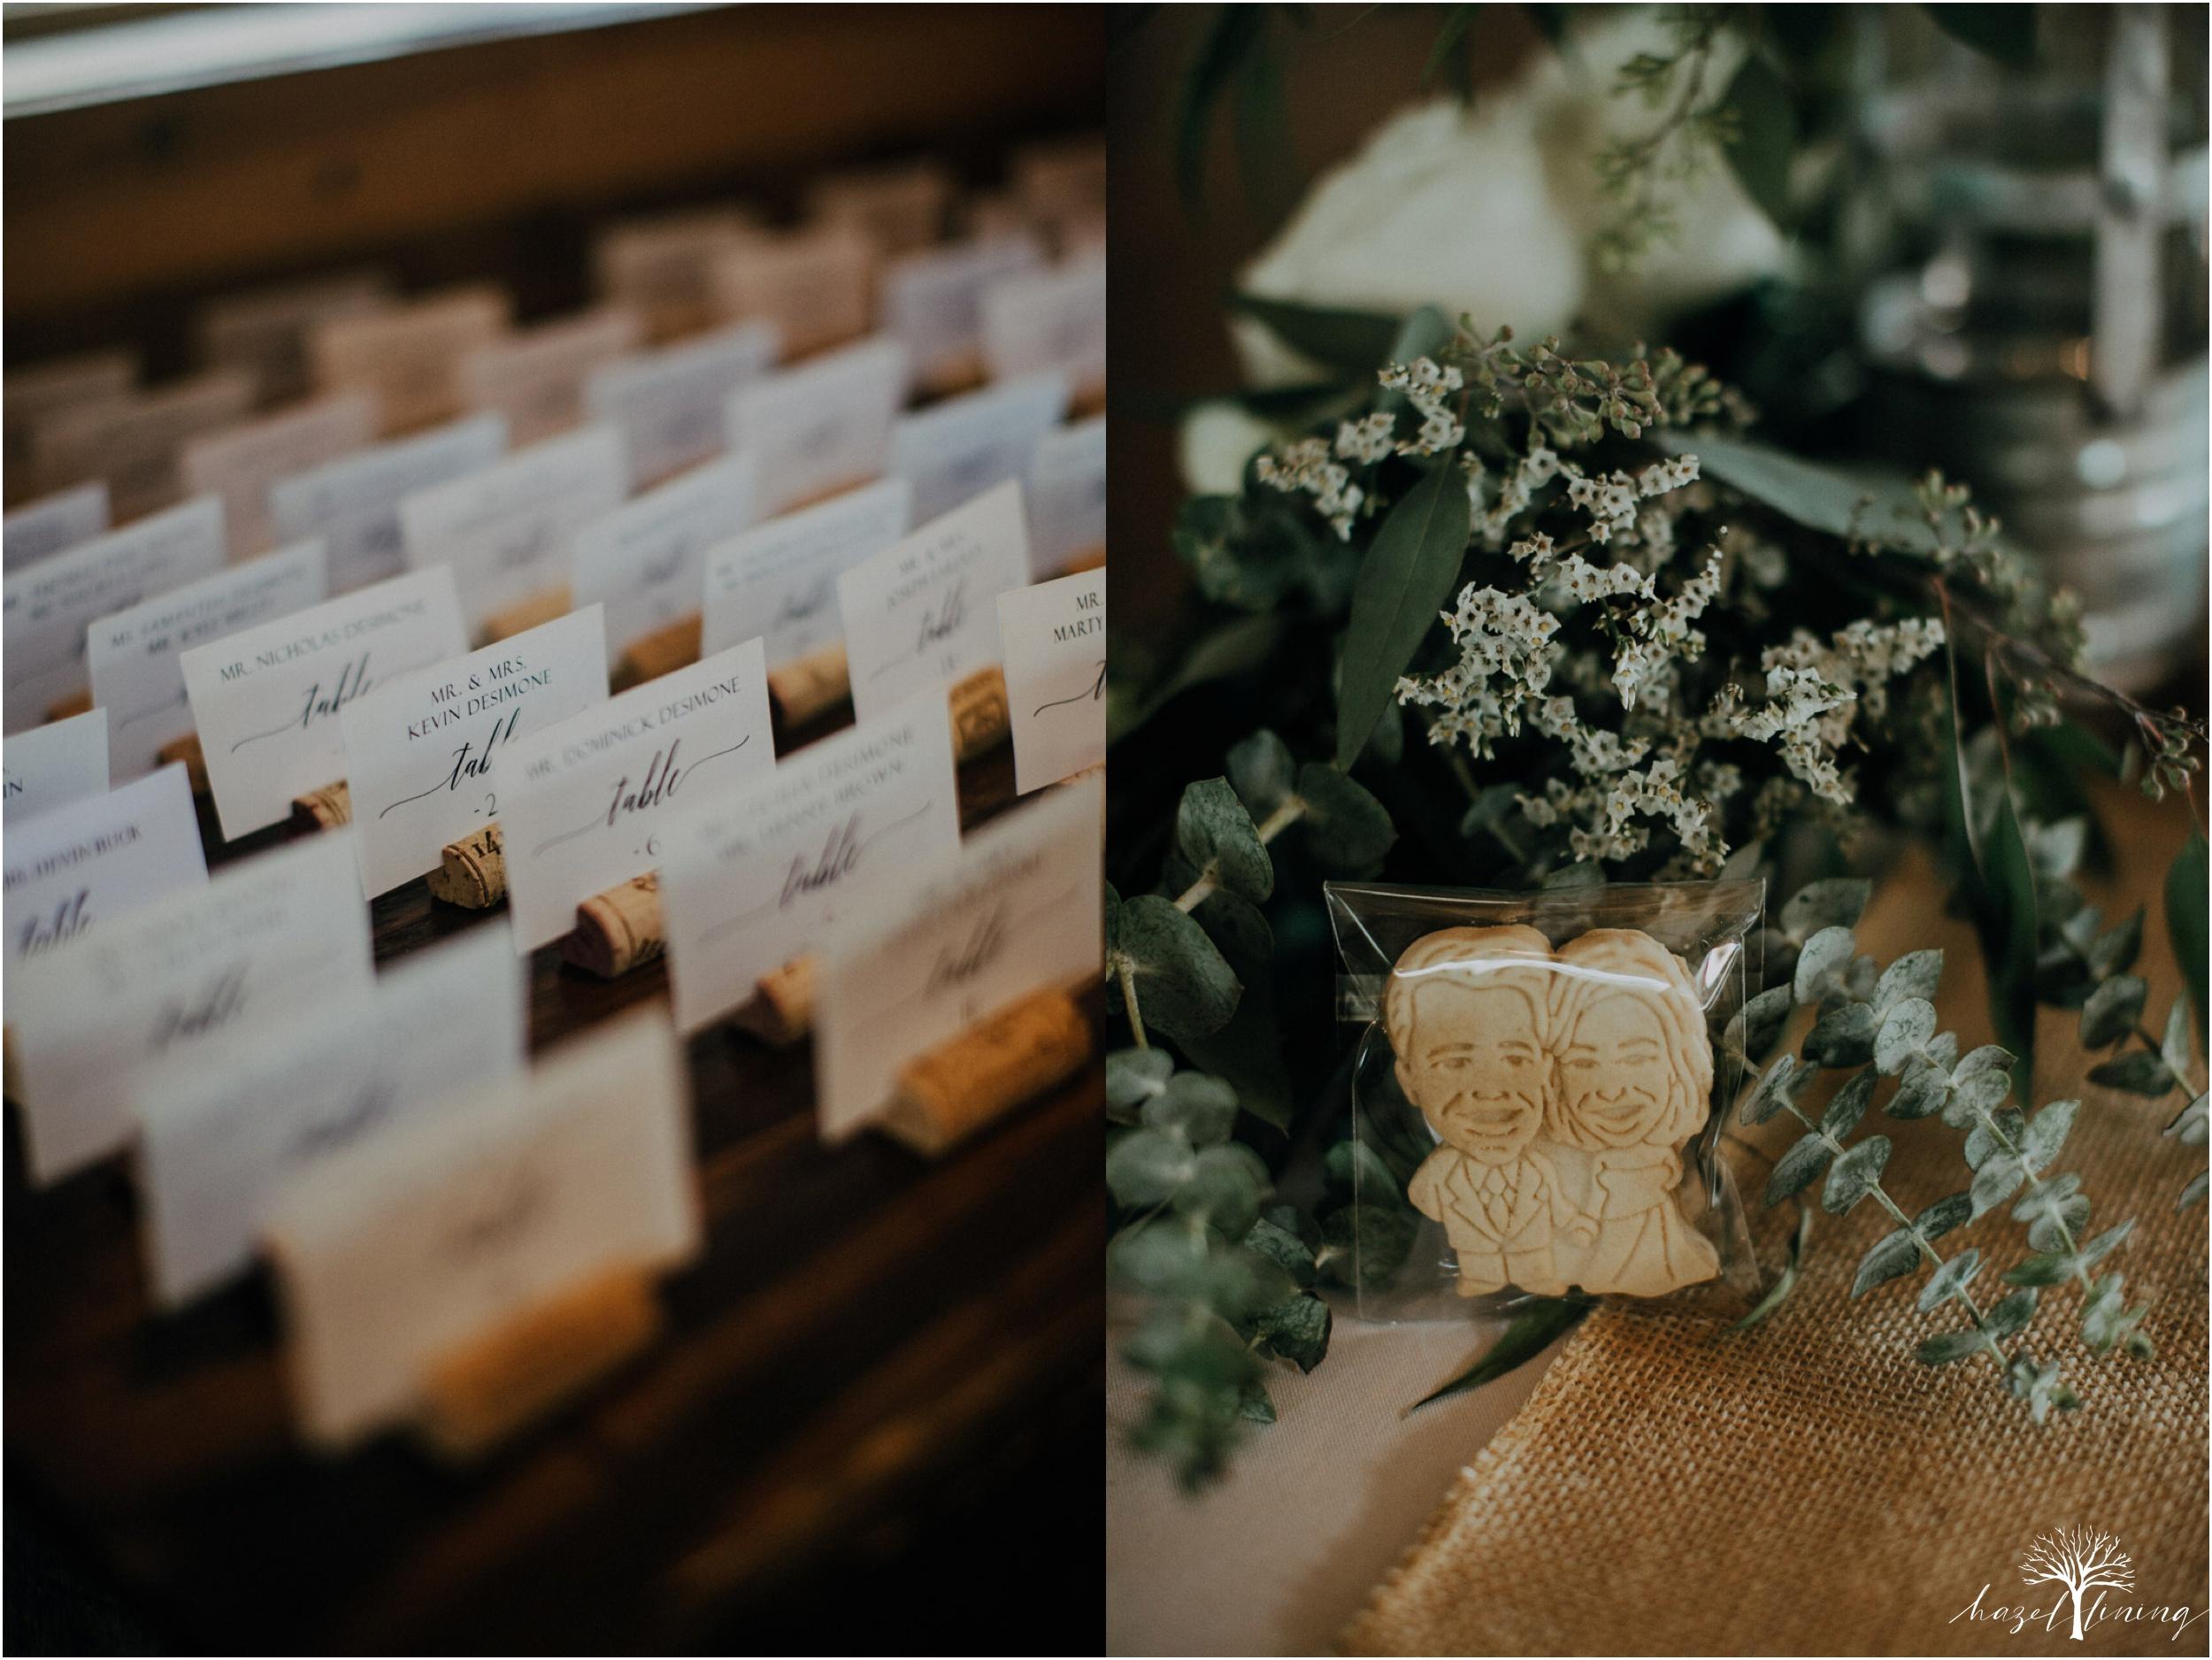 maureen-hepner-anthony-giordano-rose-bank-winery-newtow-pennsylvania-luxury-summer-wedding-hazel-lining-photography-destination-elopement-wedding-engagement-photography_0123.jpg